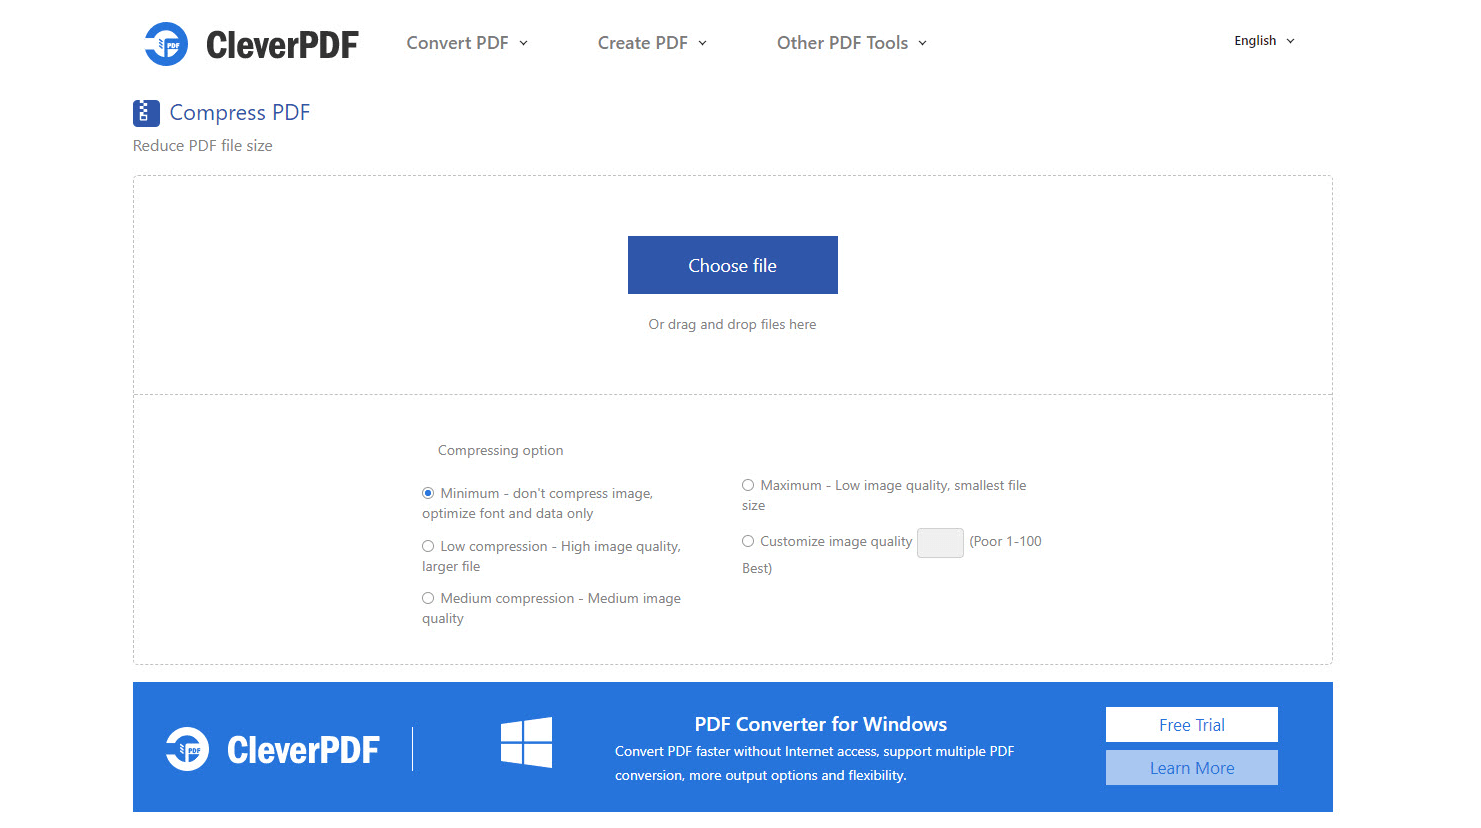 Compress PDF or Reduce PDF file size Step 1 Choose a PDF file and upload